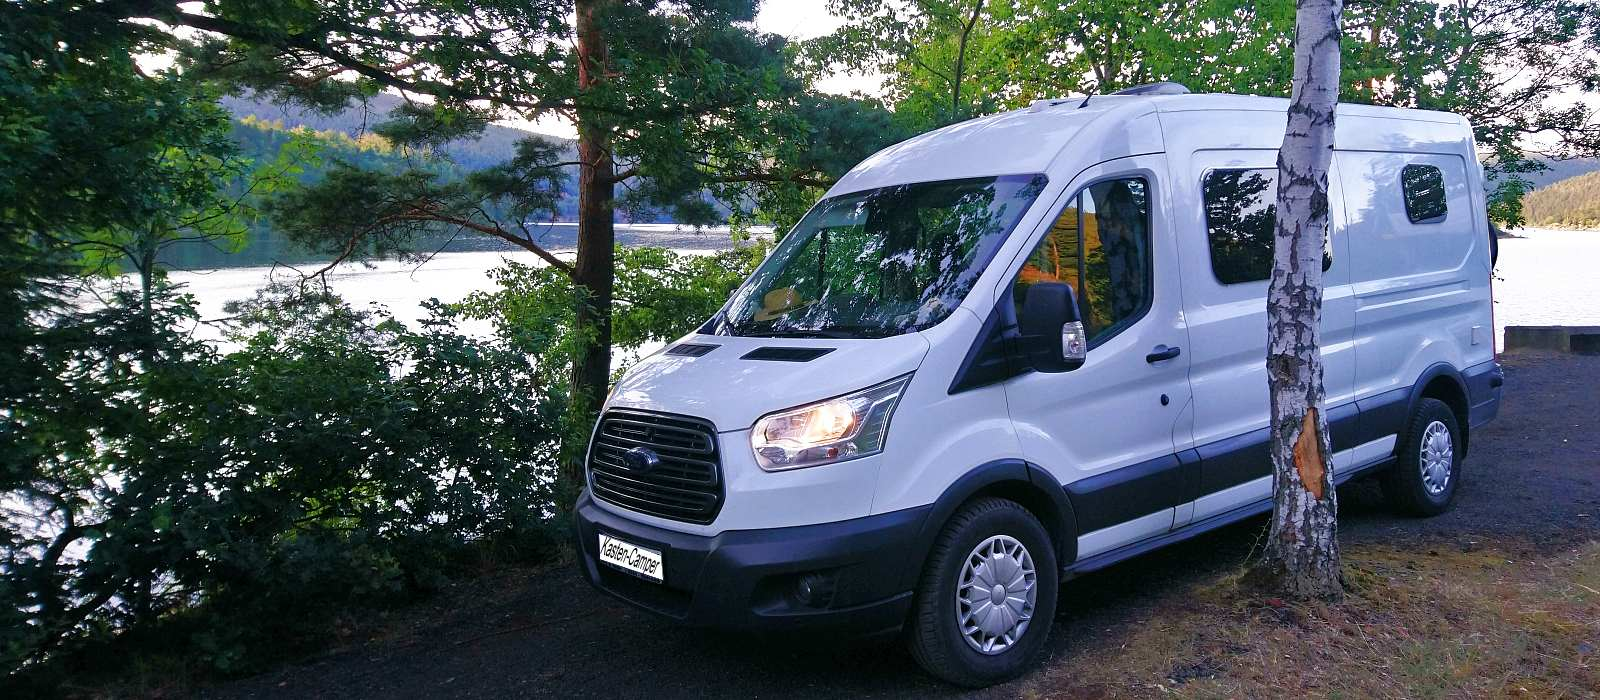 Ford Tansit Camper Ausbau Anleitung